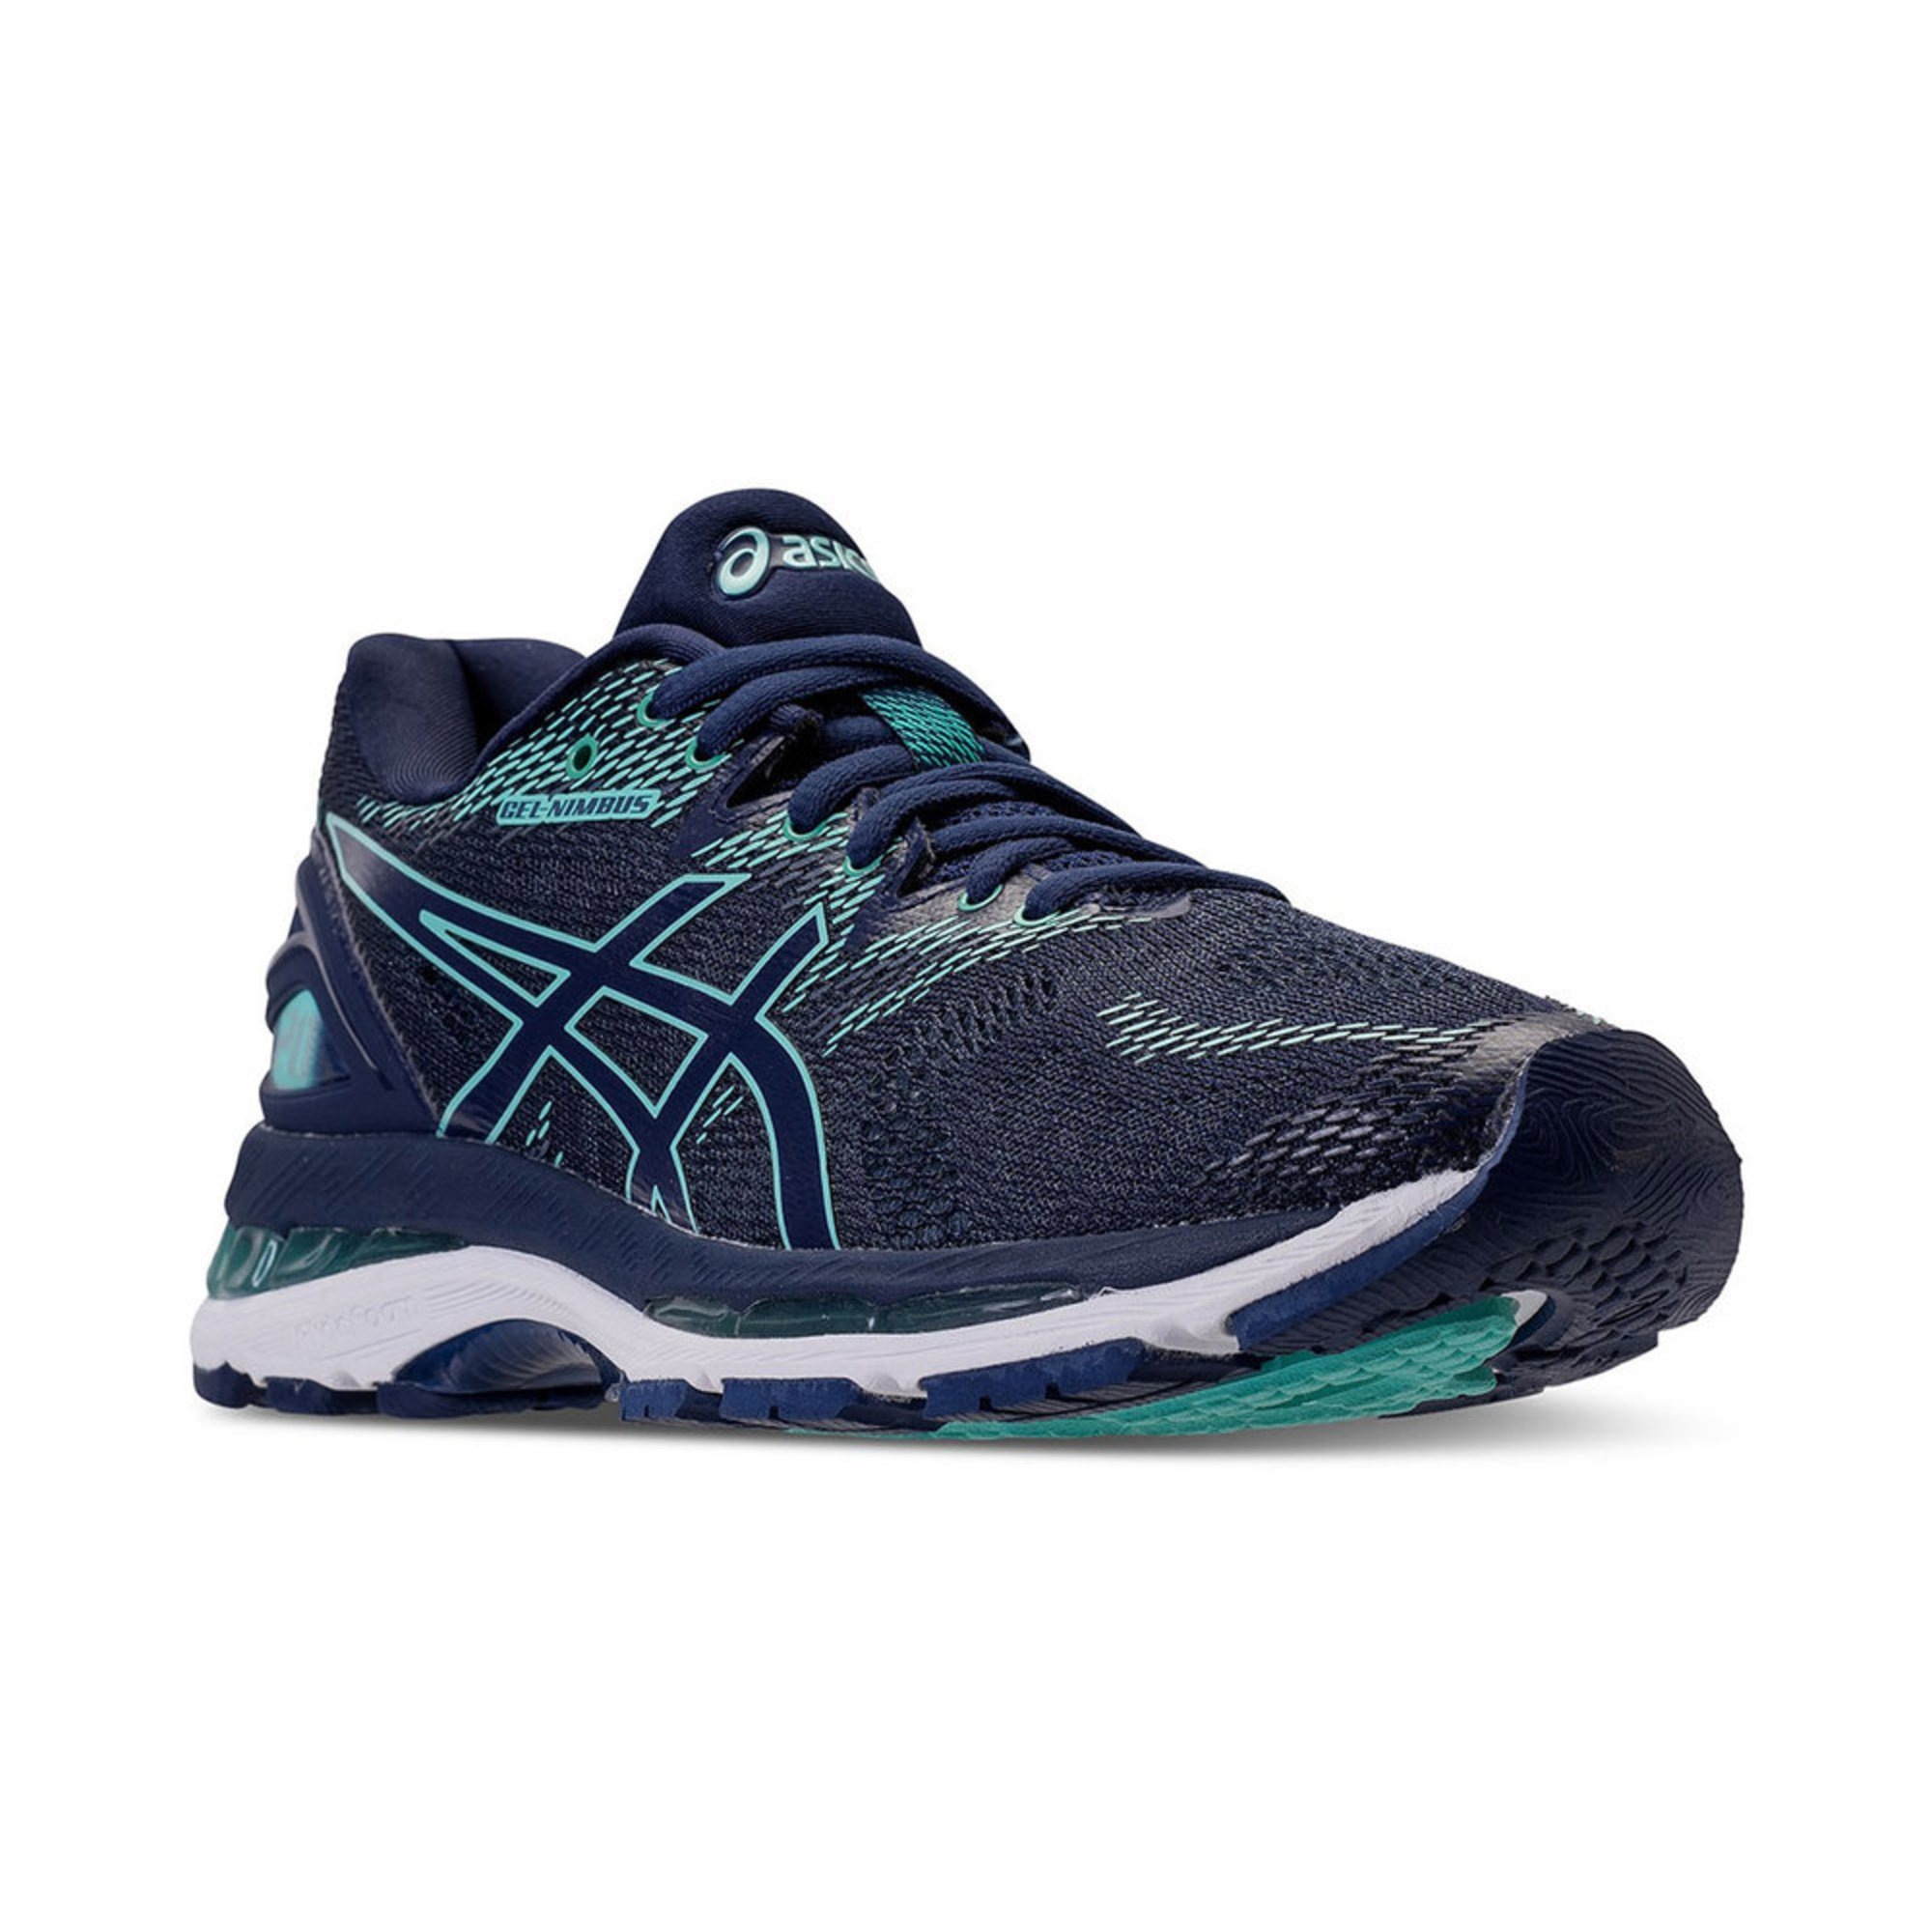 ShoeShoes 20 Gel Running Nimbus Women's Asics L54jAR